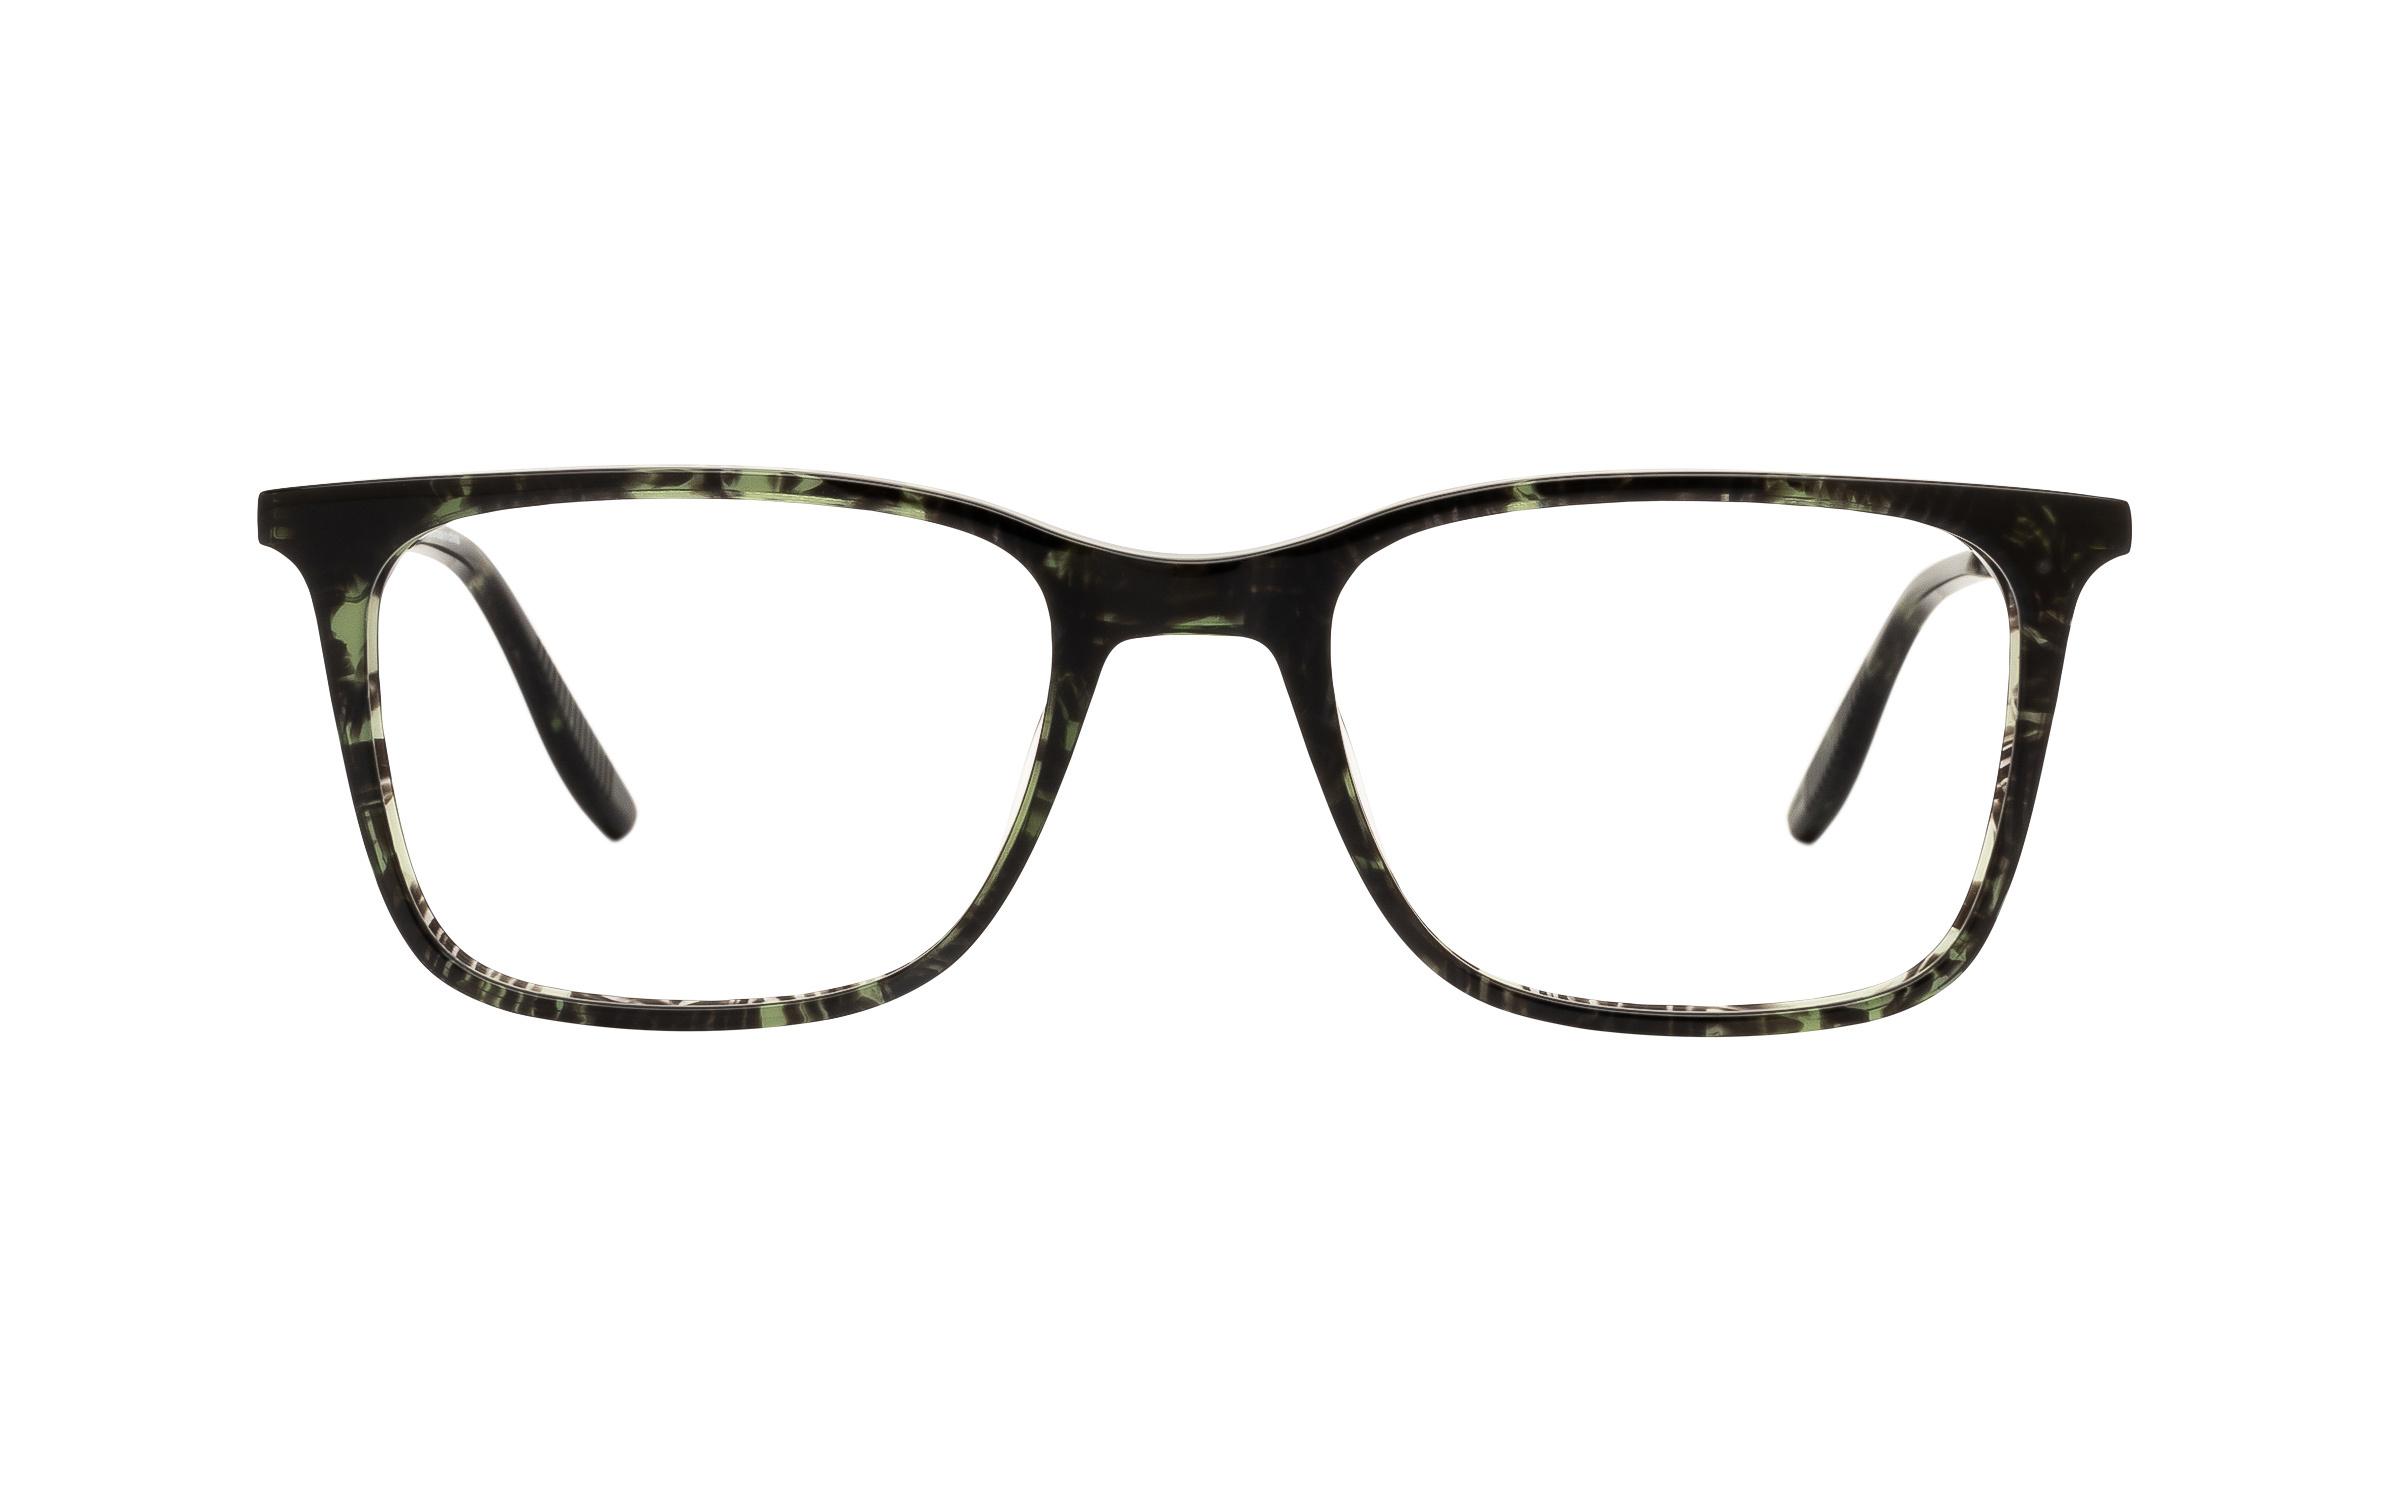 Joseph Marc Boyd JM061 C04 (52) Eyeglasses and Frame in Dark Khaki Havana Green/Tortoise | Acetate/Metal - Online Coastal